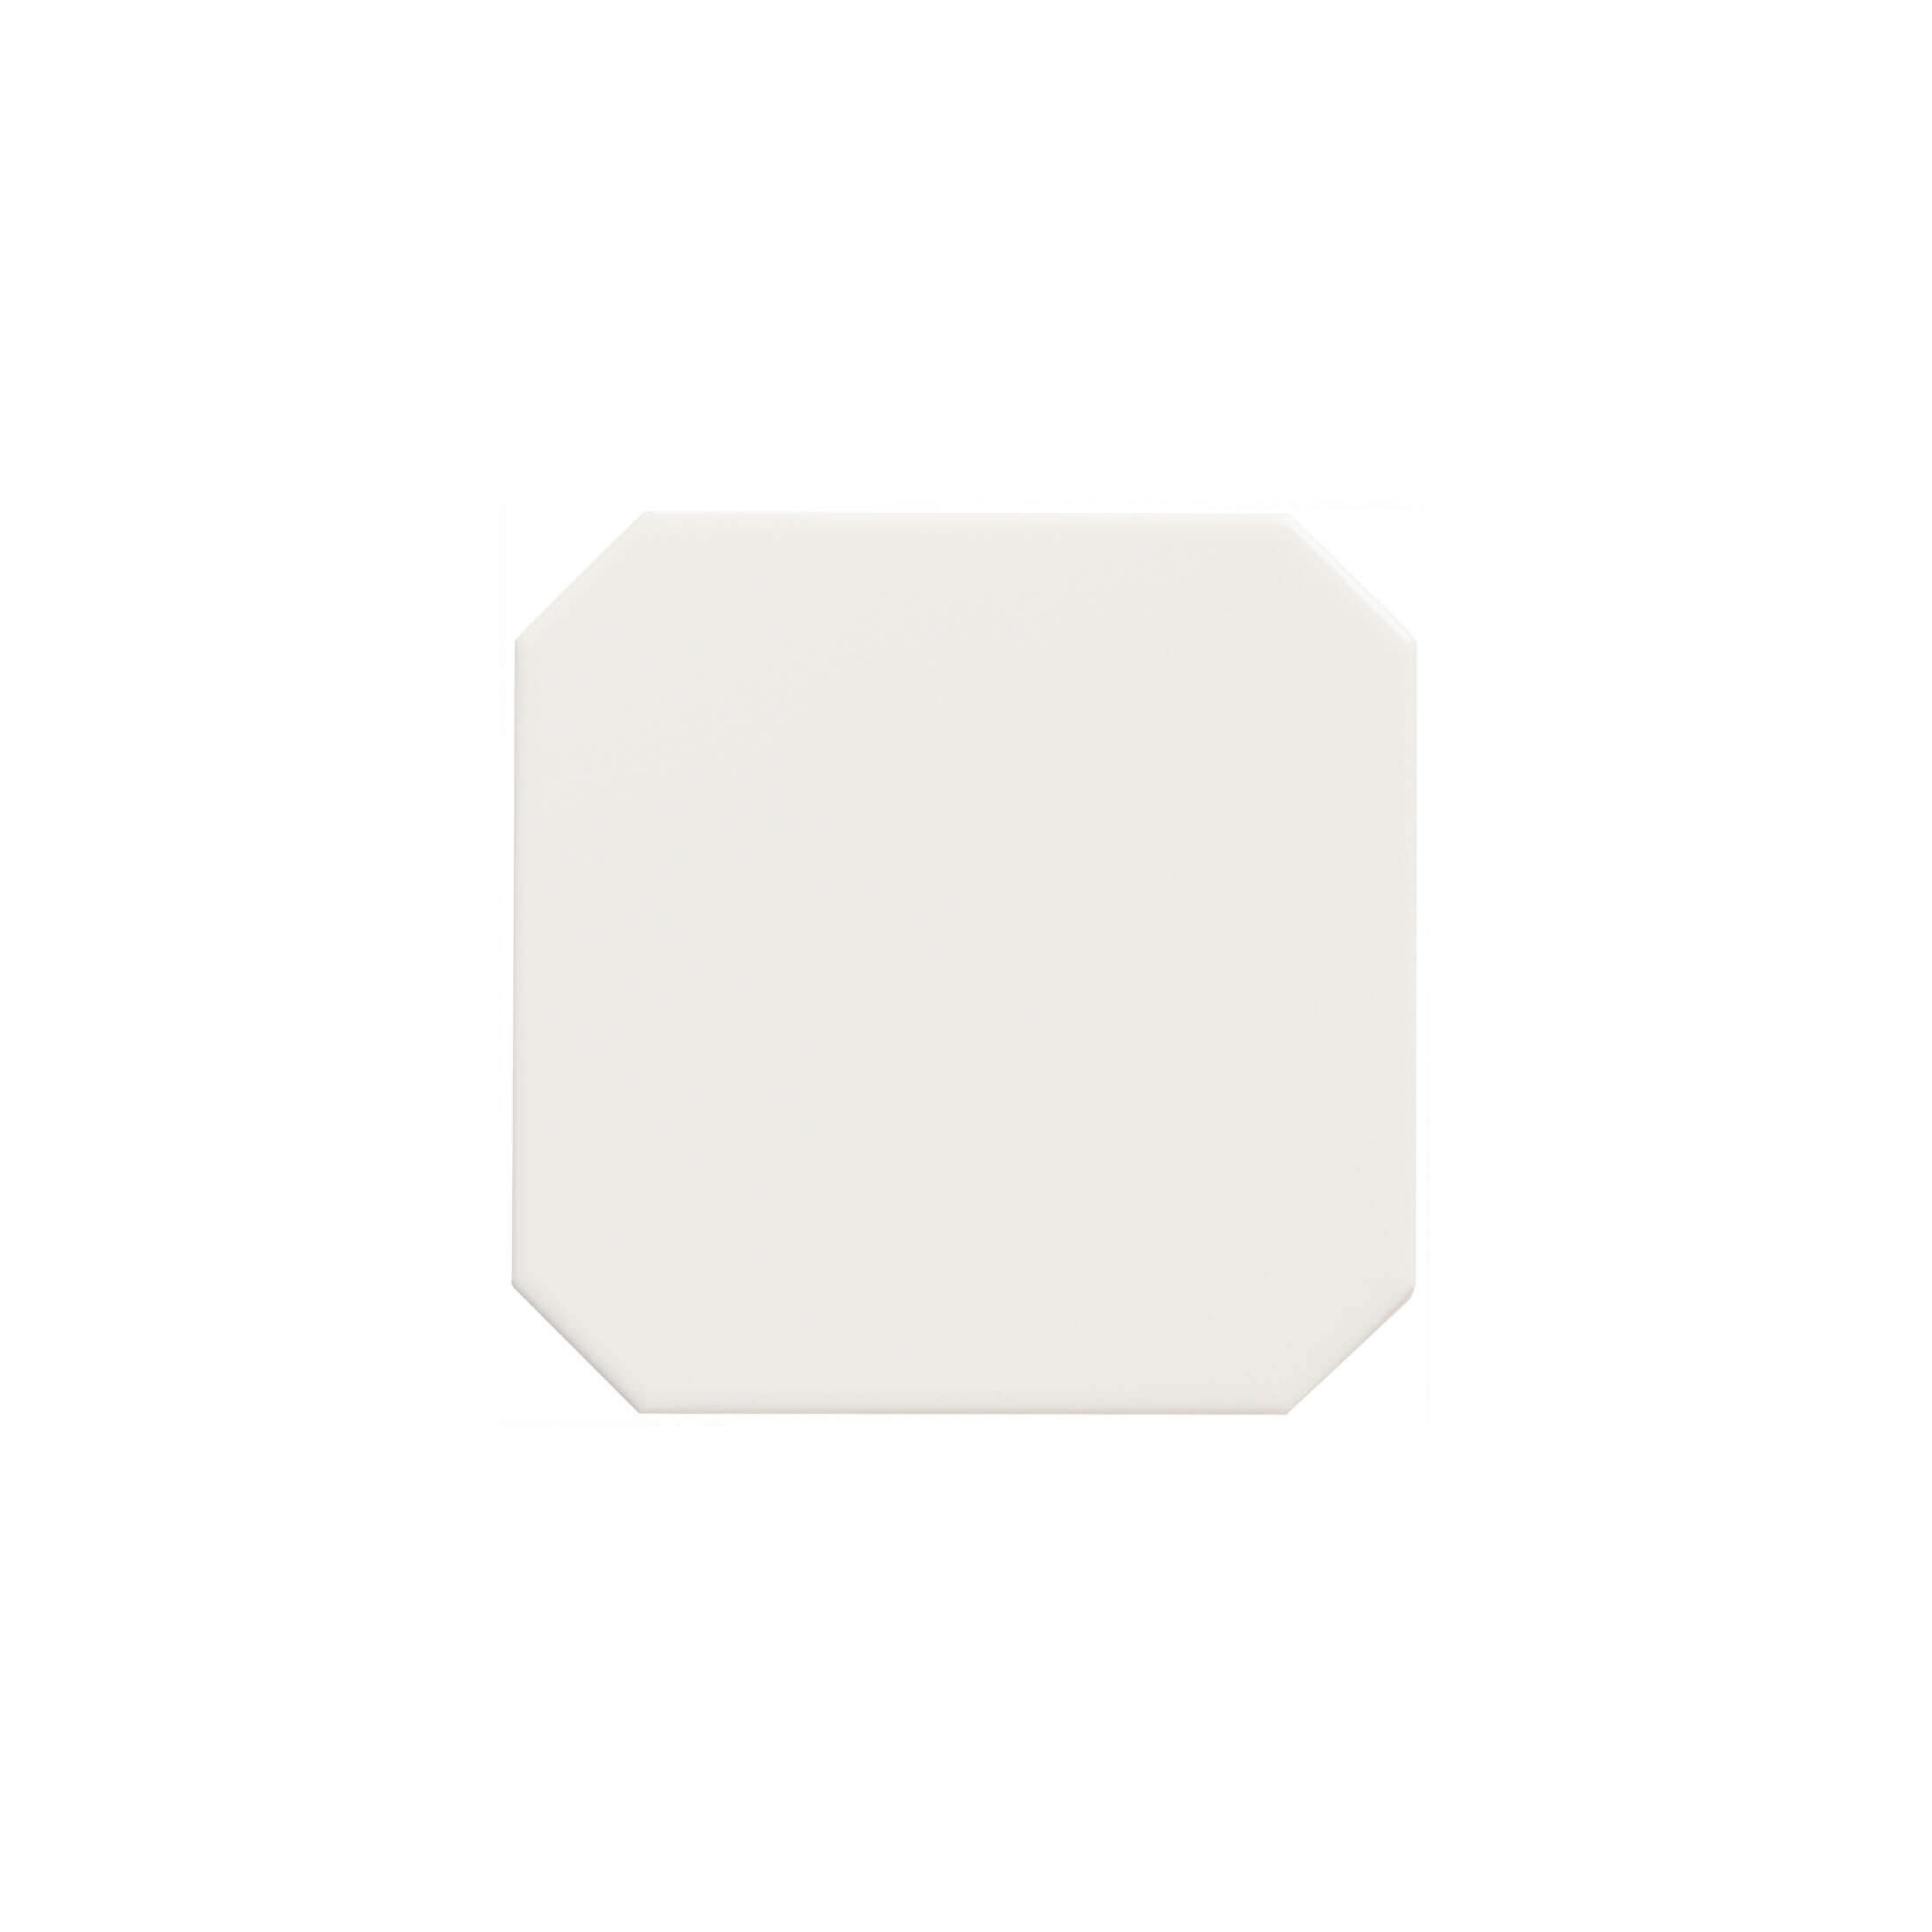 ADST1029 - OCTOGONO  - 14.8 cm X 14.8 cm